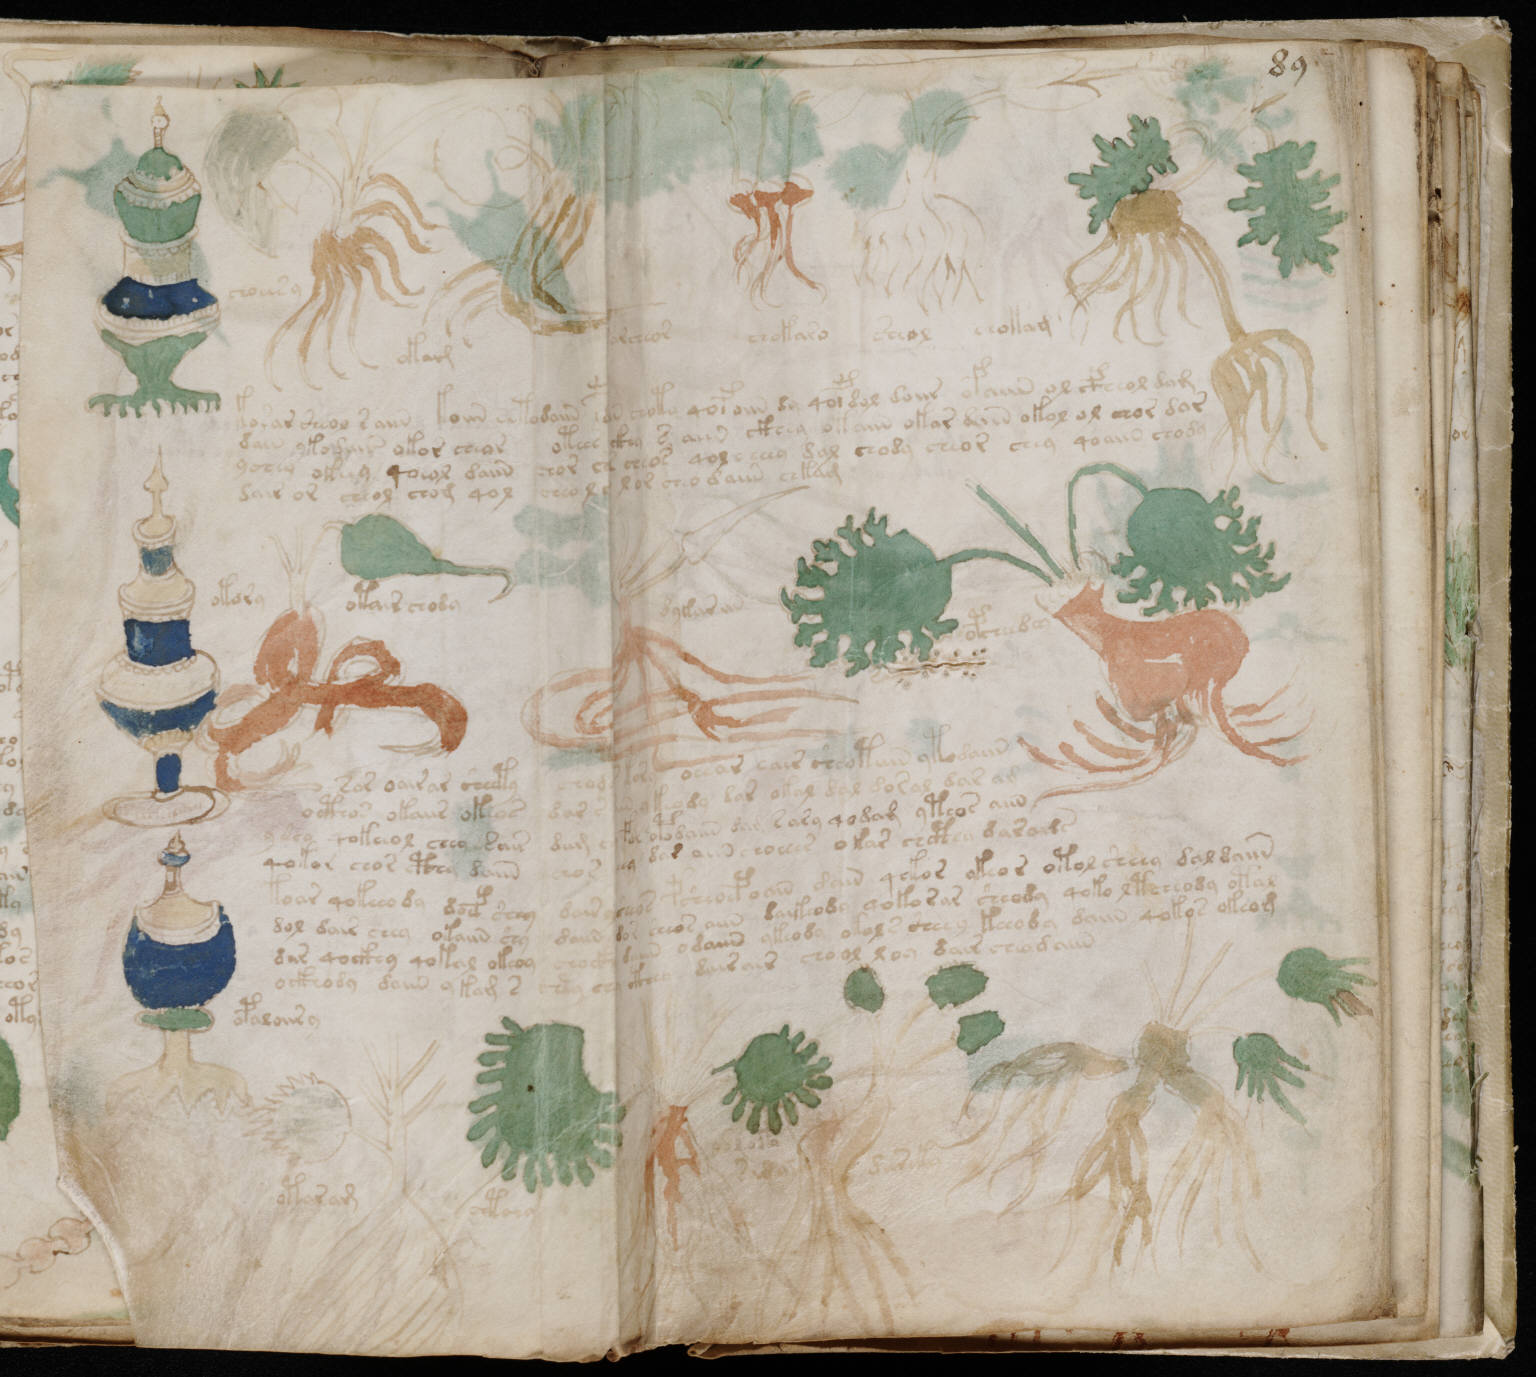 Voynich Manuscript %28163%29 ヴォイニッチ手稿(写本) どの言語にも属さない謎の文字!